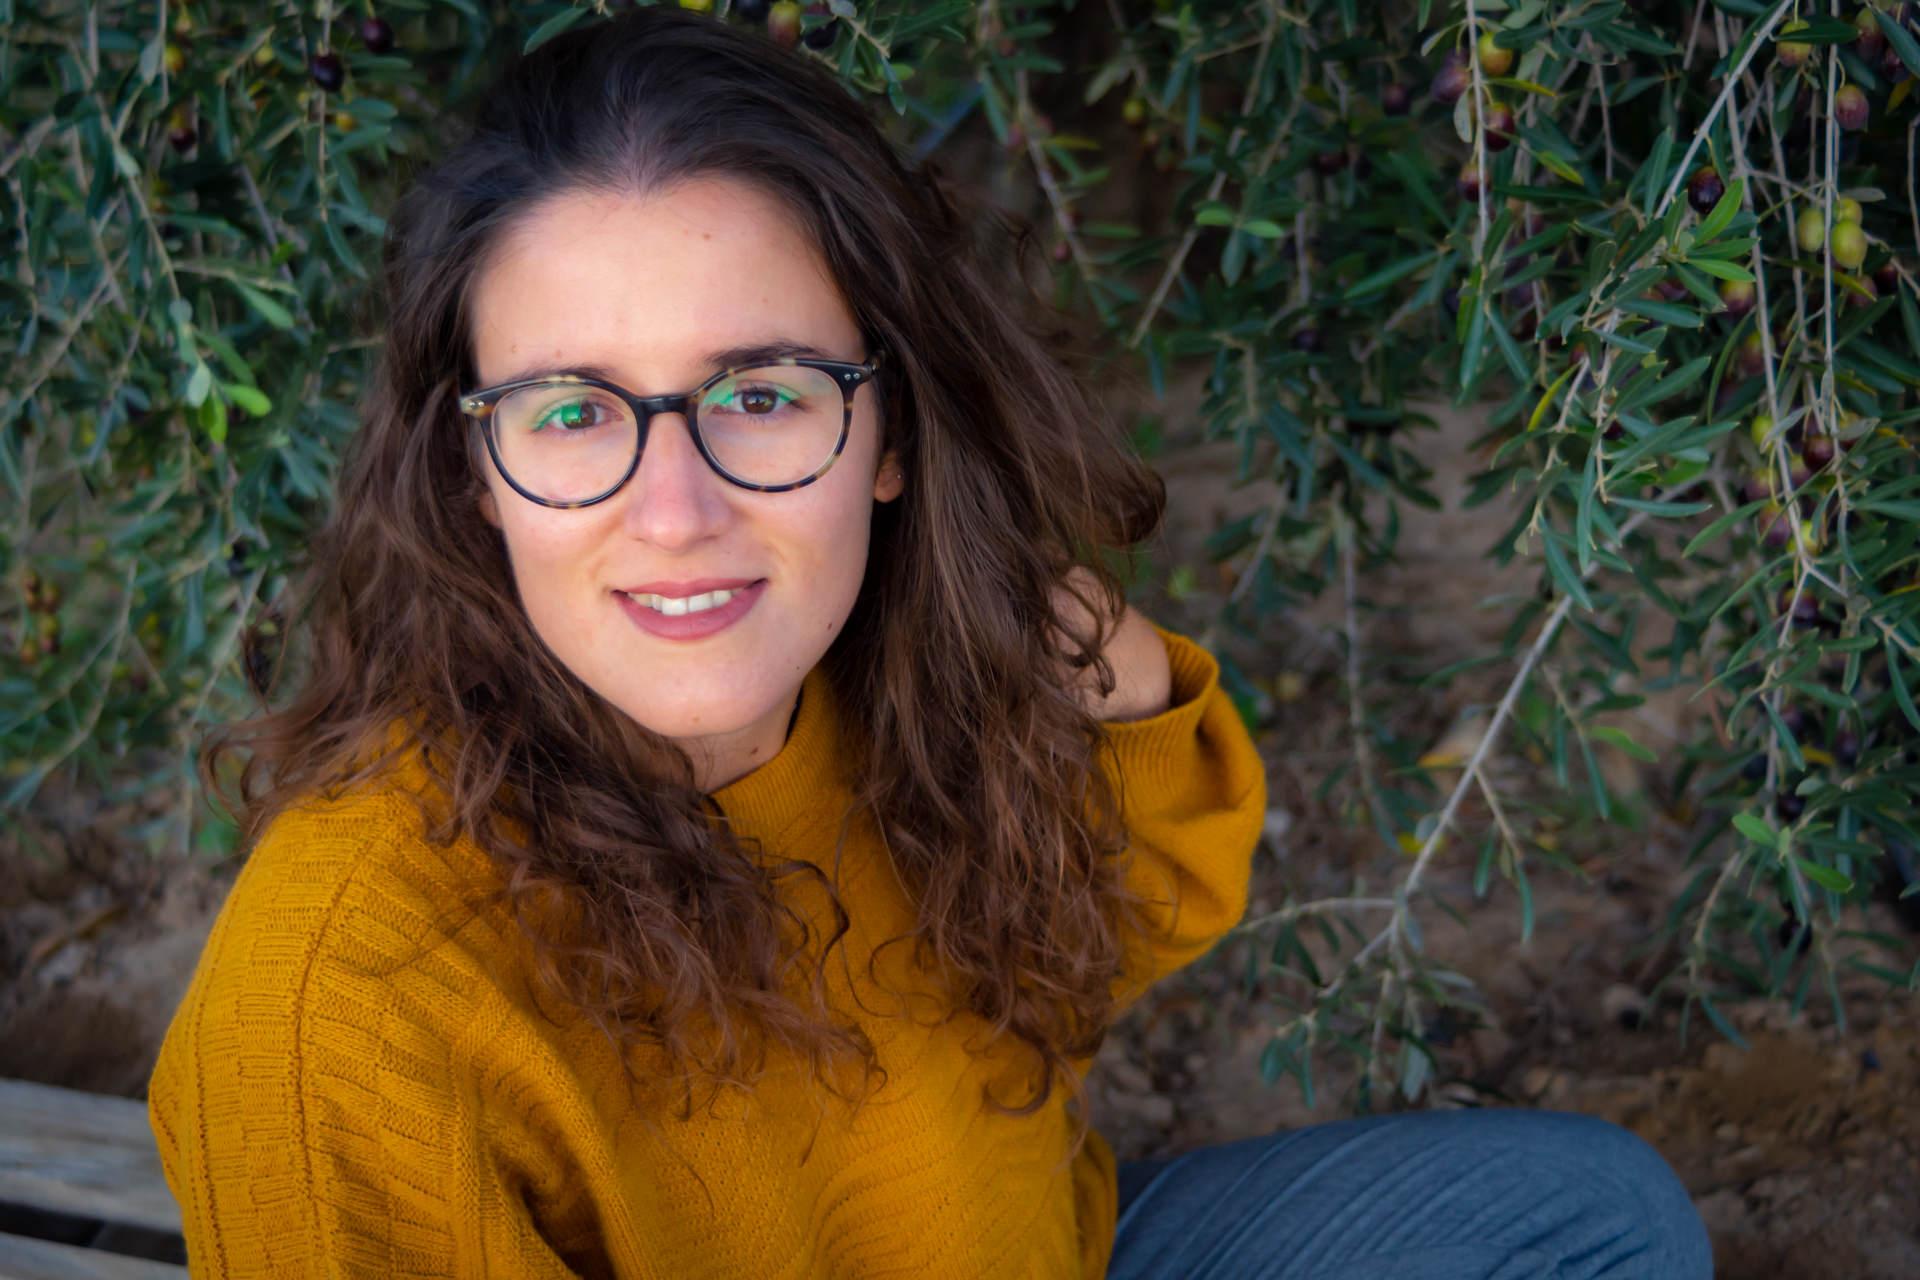 Elena Cáceres | Dietas saludables